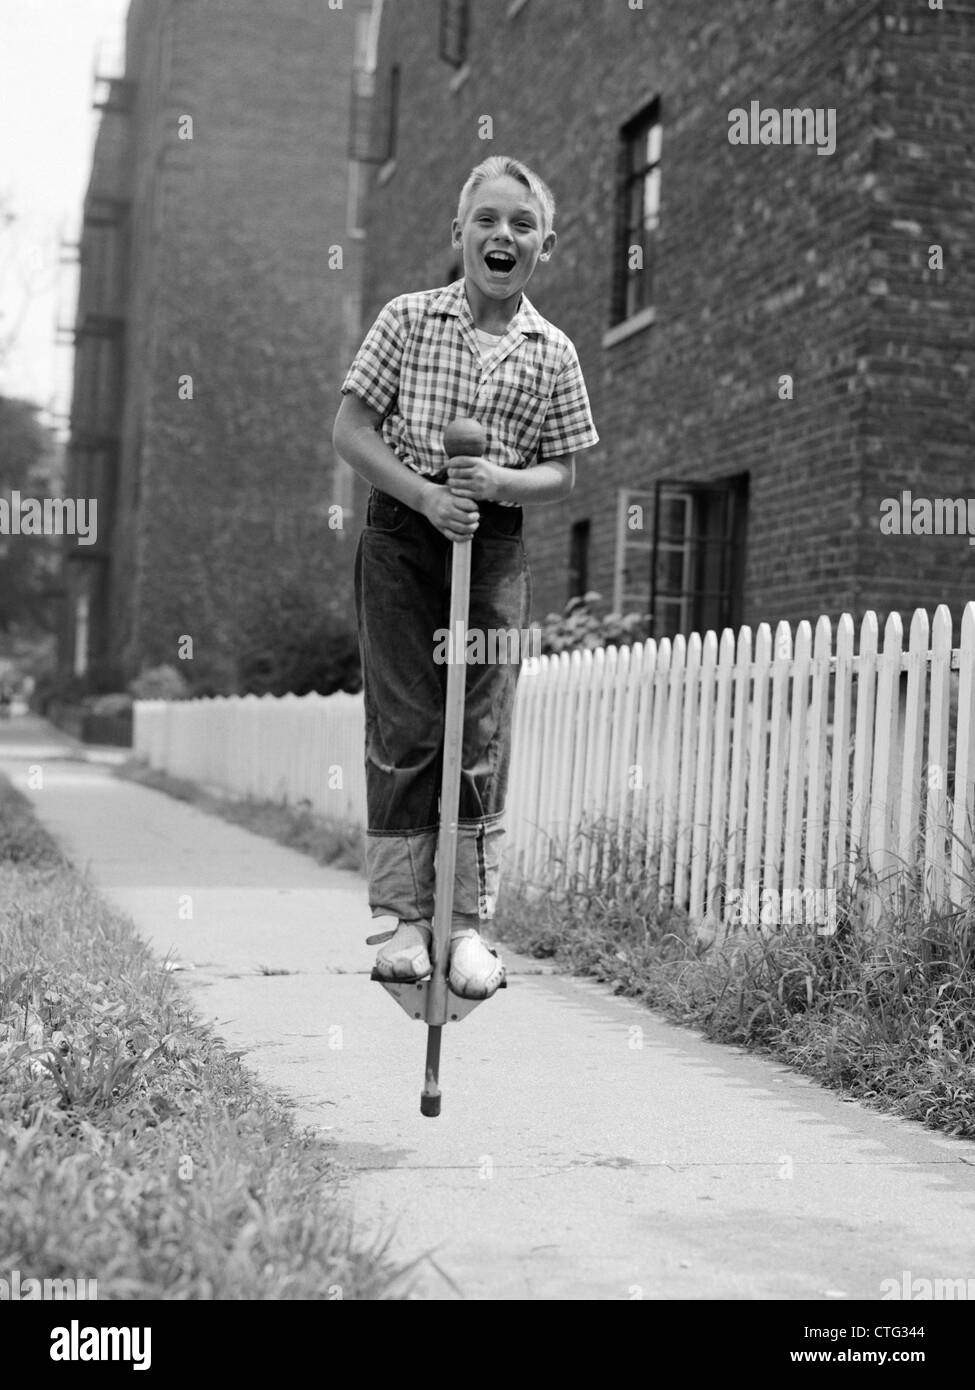 1960s BOY ON POGO STICK ON SIDEWALK - Stock Image